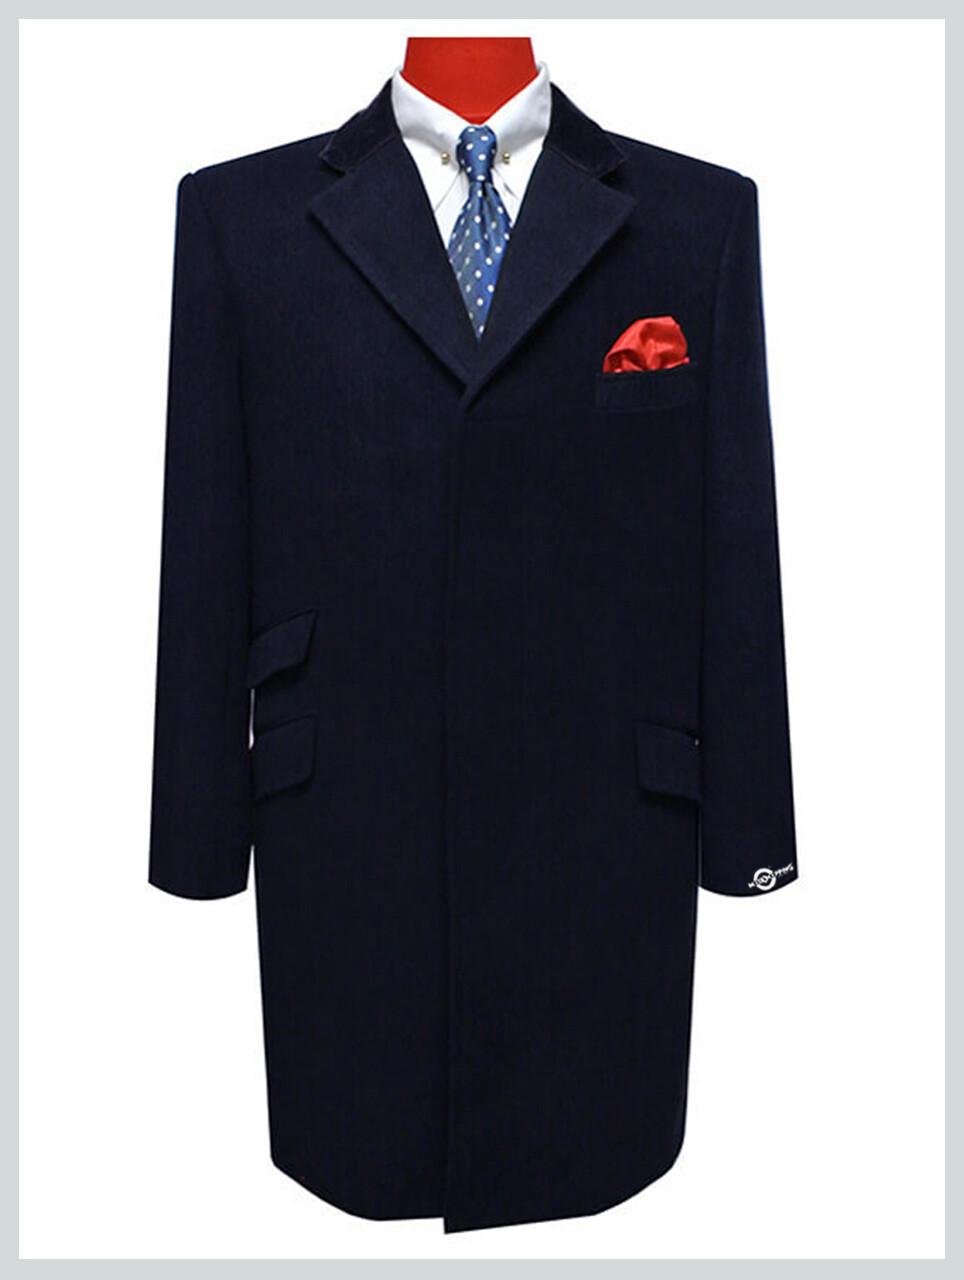 Black Overcoat| Tailore Made Mod Fashion Original Vintage Long Wool Overcoat For Men